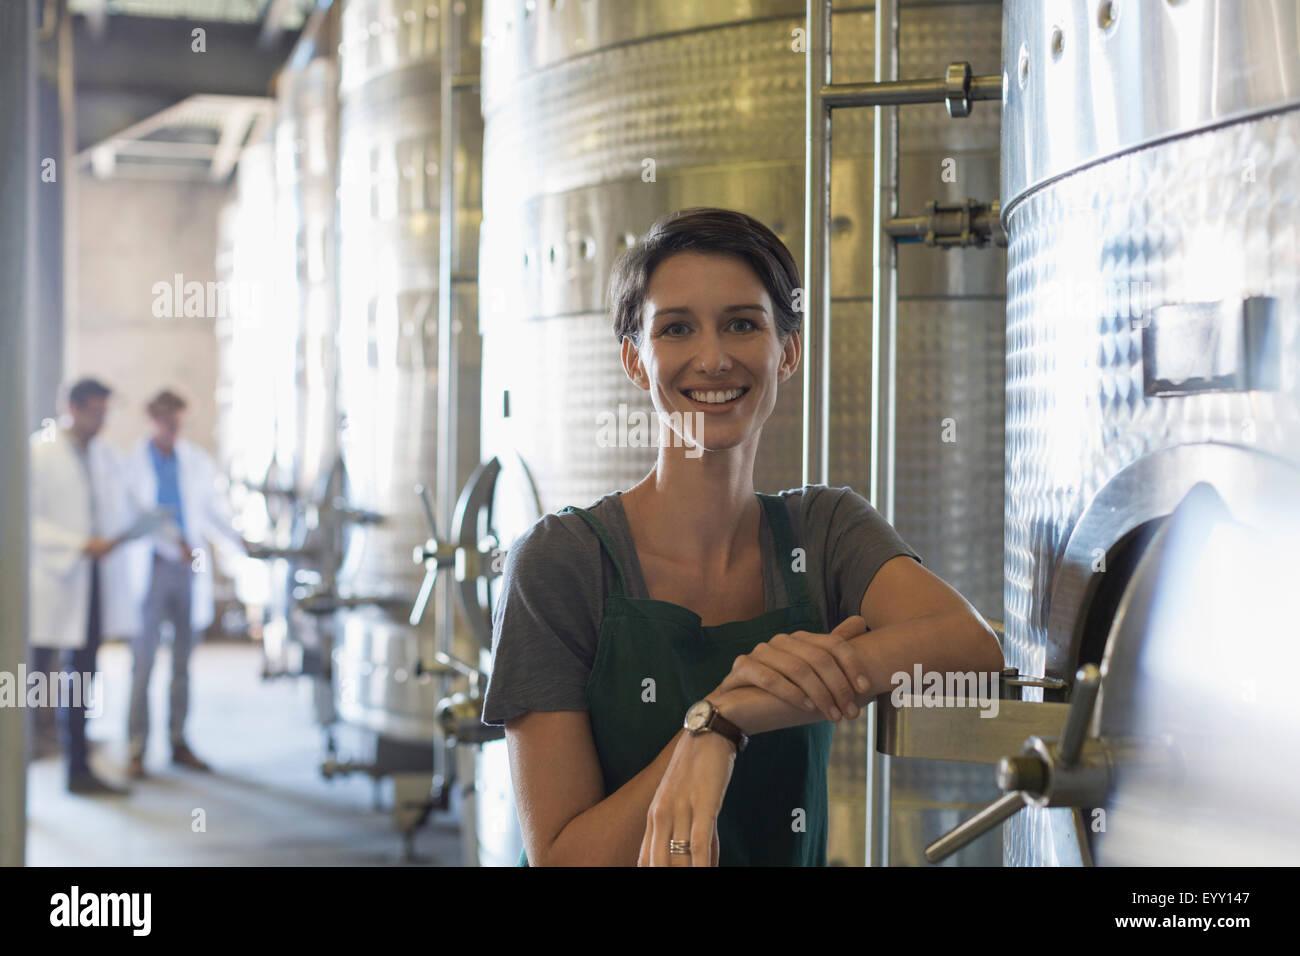 Portrait smiling vintner at stainless steel vat in winery cellar - Stock Image